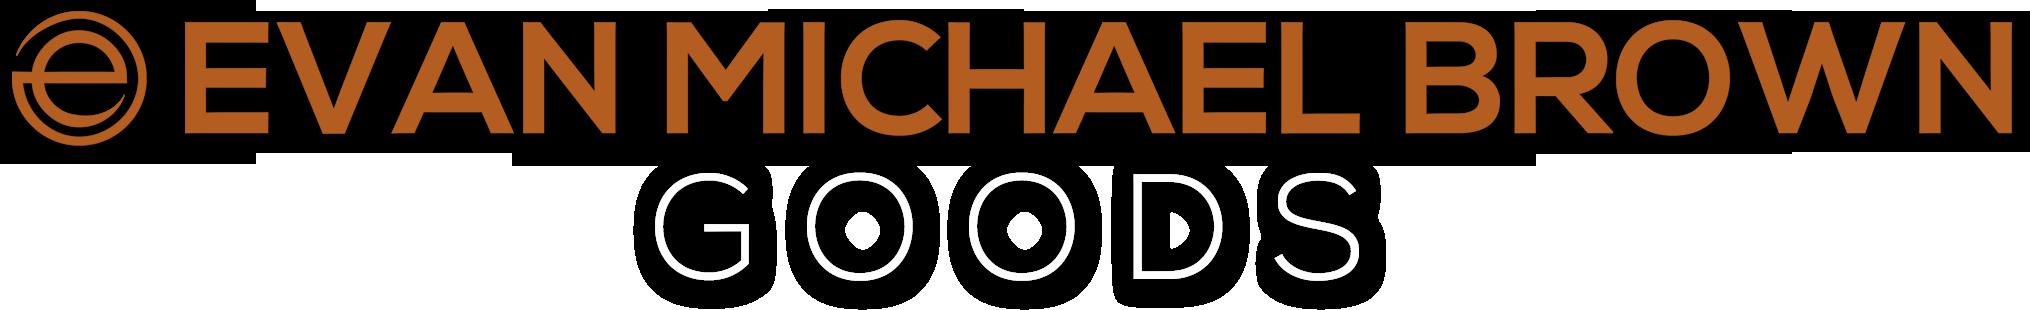 goods-logo.png